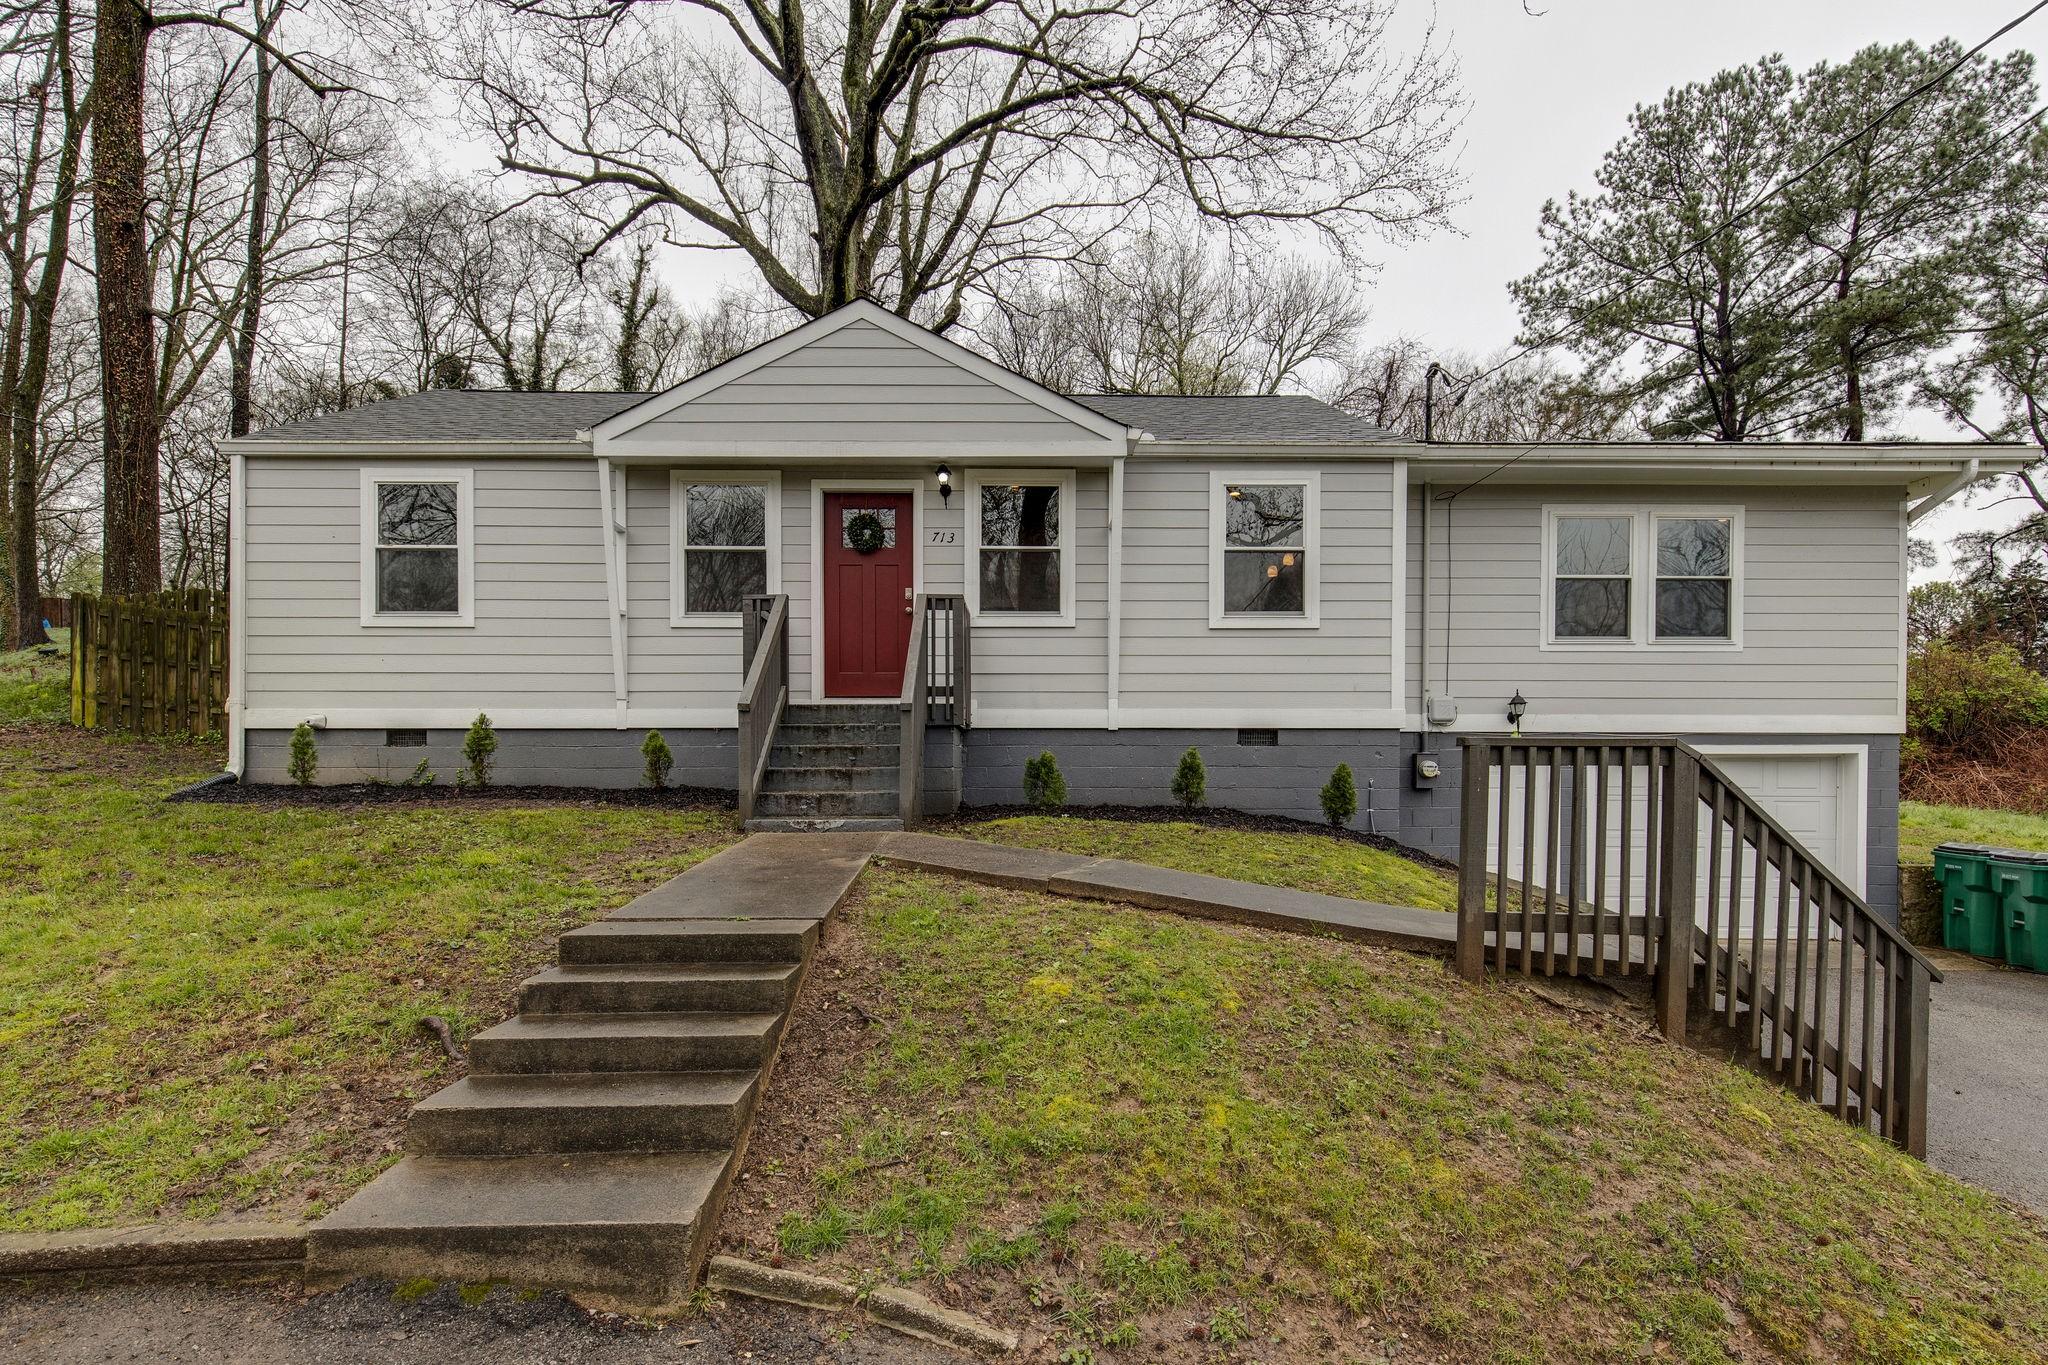 713 Drummond Dr, Nashville, TN 37211 - Nashville, TN real estate listing